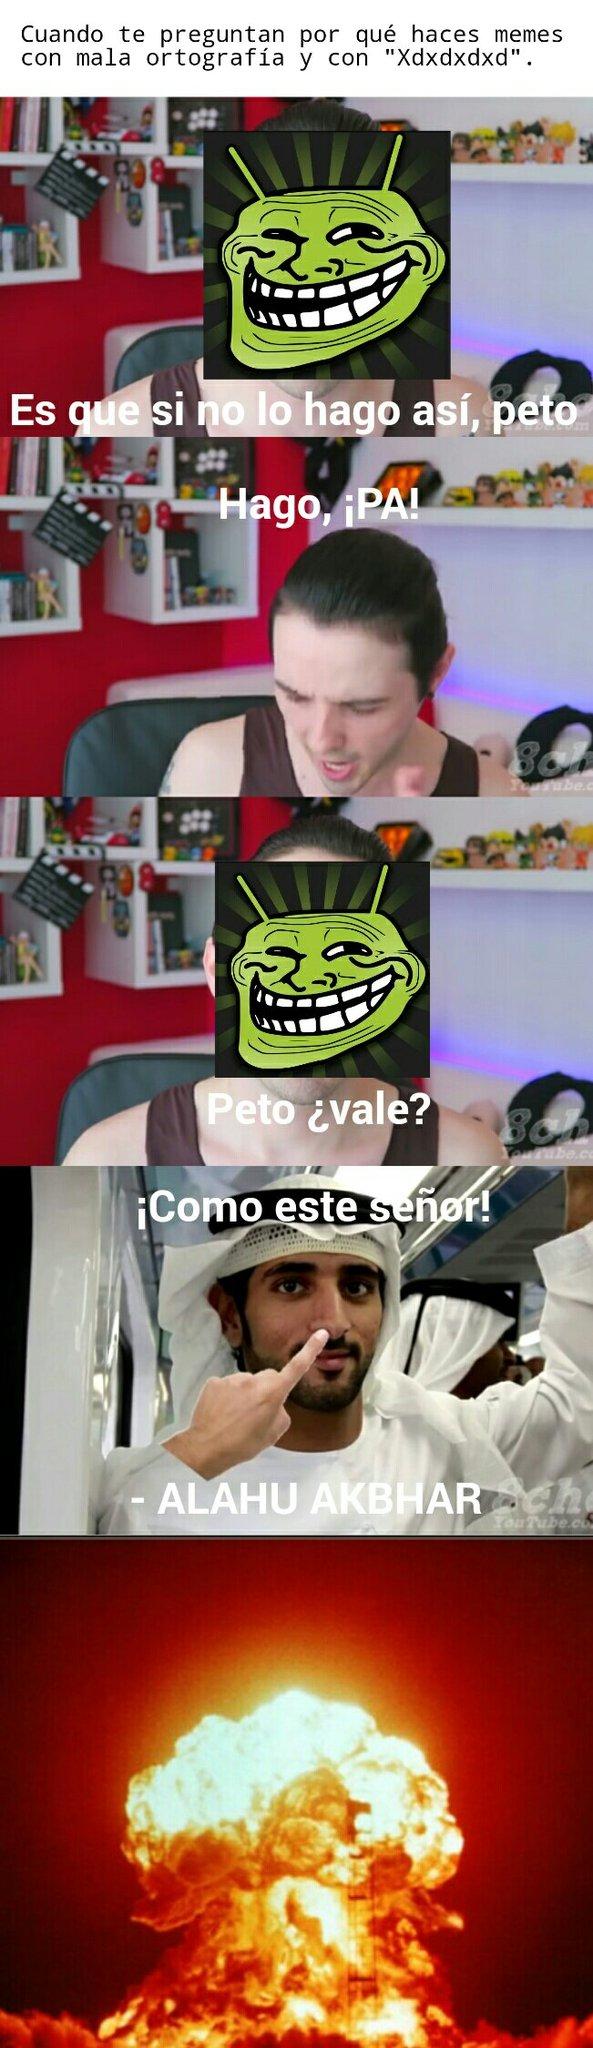 Meme original :)